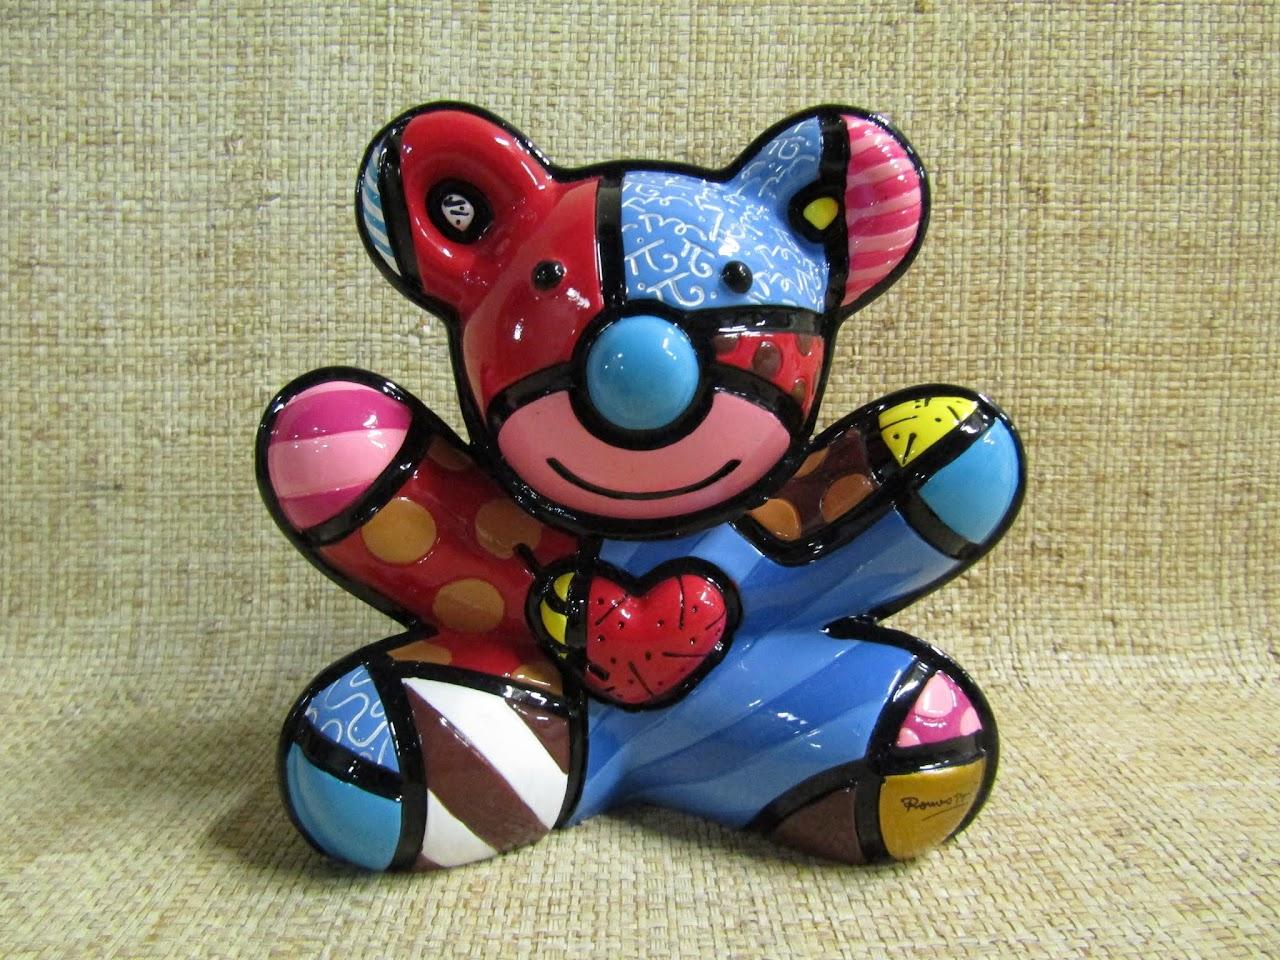 Britto 'Cuddly Bear' Figurine